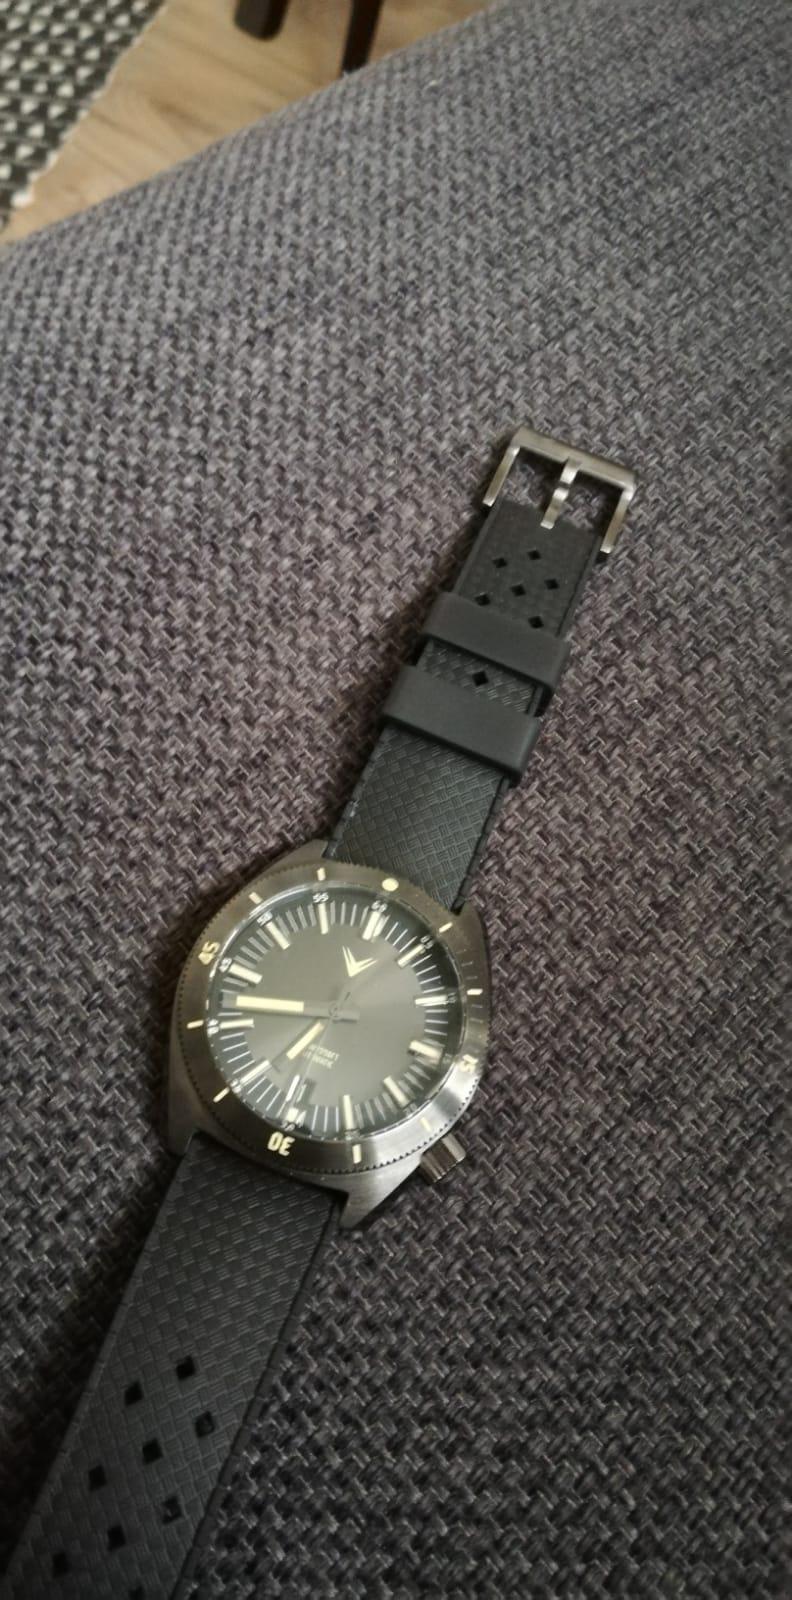 Ventus - Northstar 300m Heritage Diver  - Page 2 0c692f10